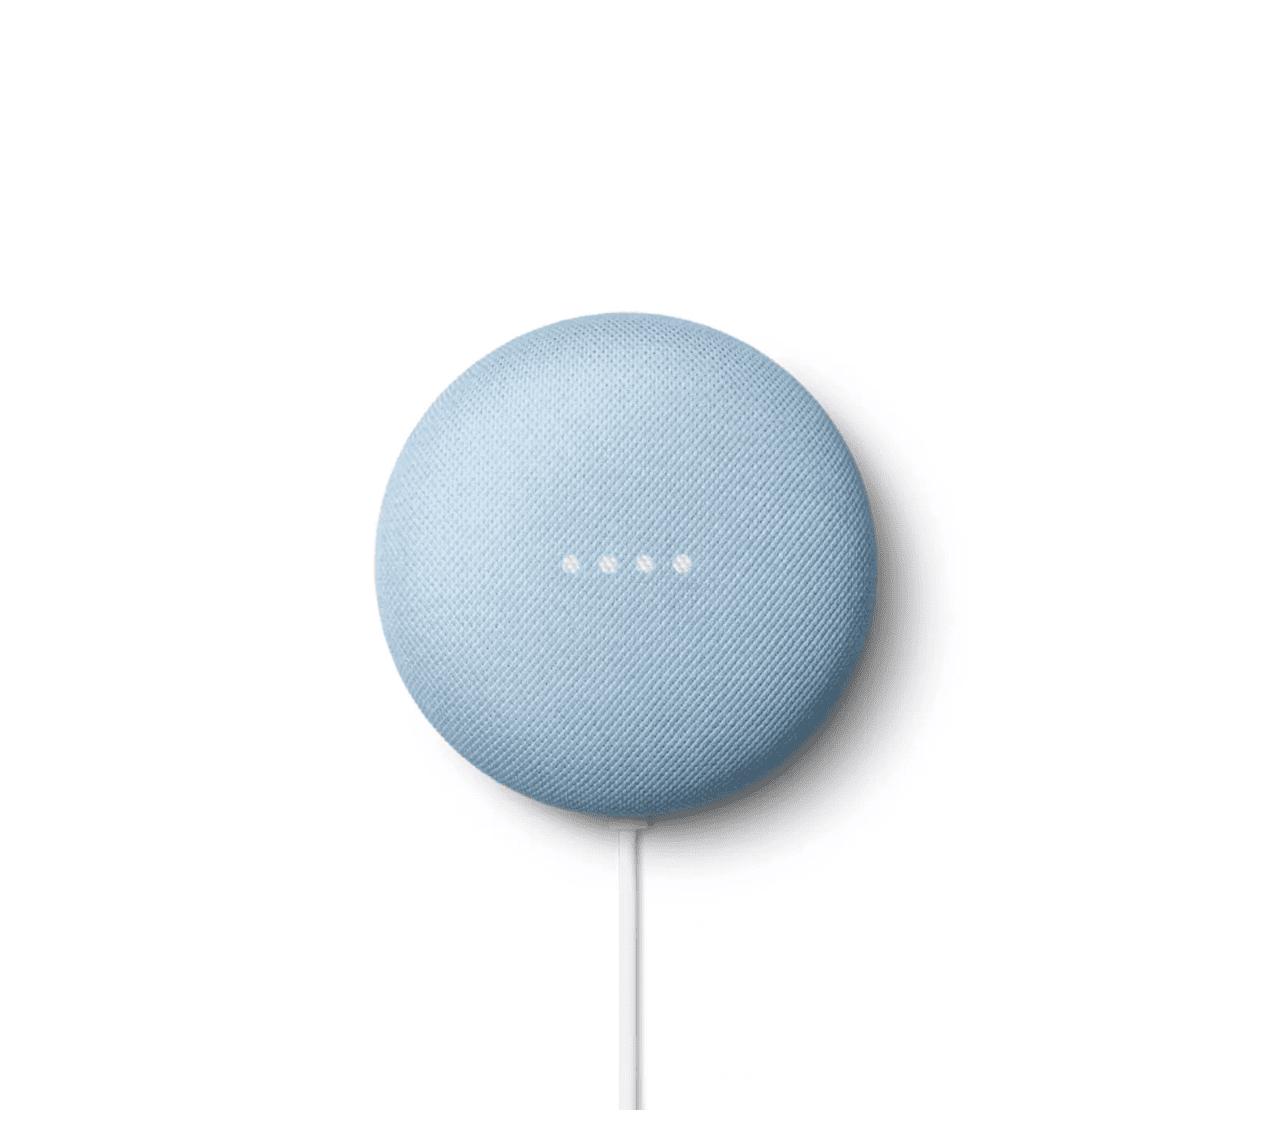 Google Nest Mini (2nd Generation)